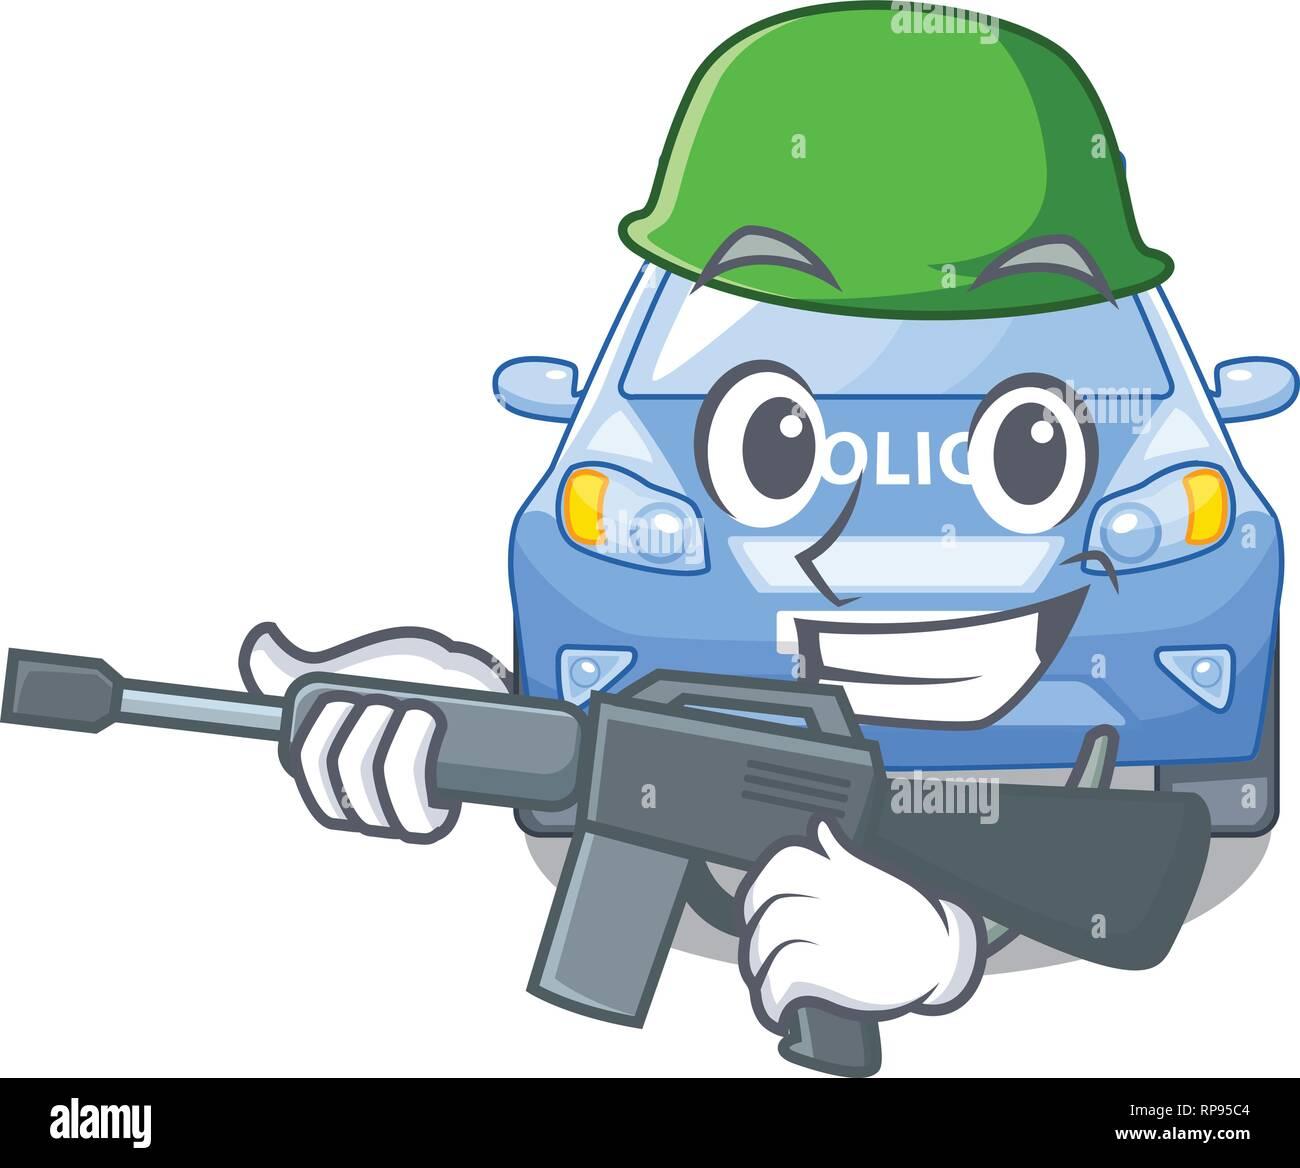 e05c2a3ba24 Military Policeman Military Police Company Stock Photos   Military ...